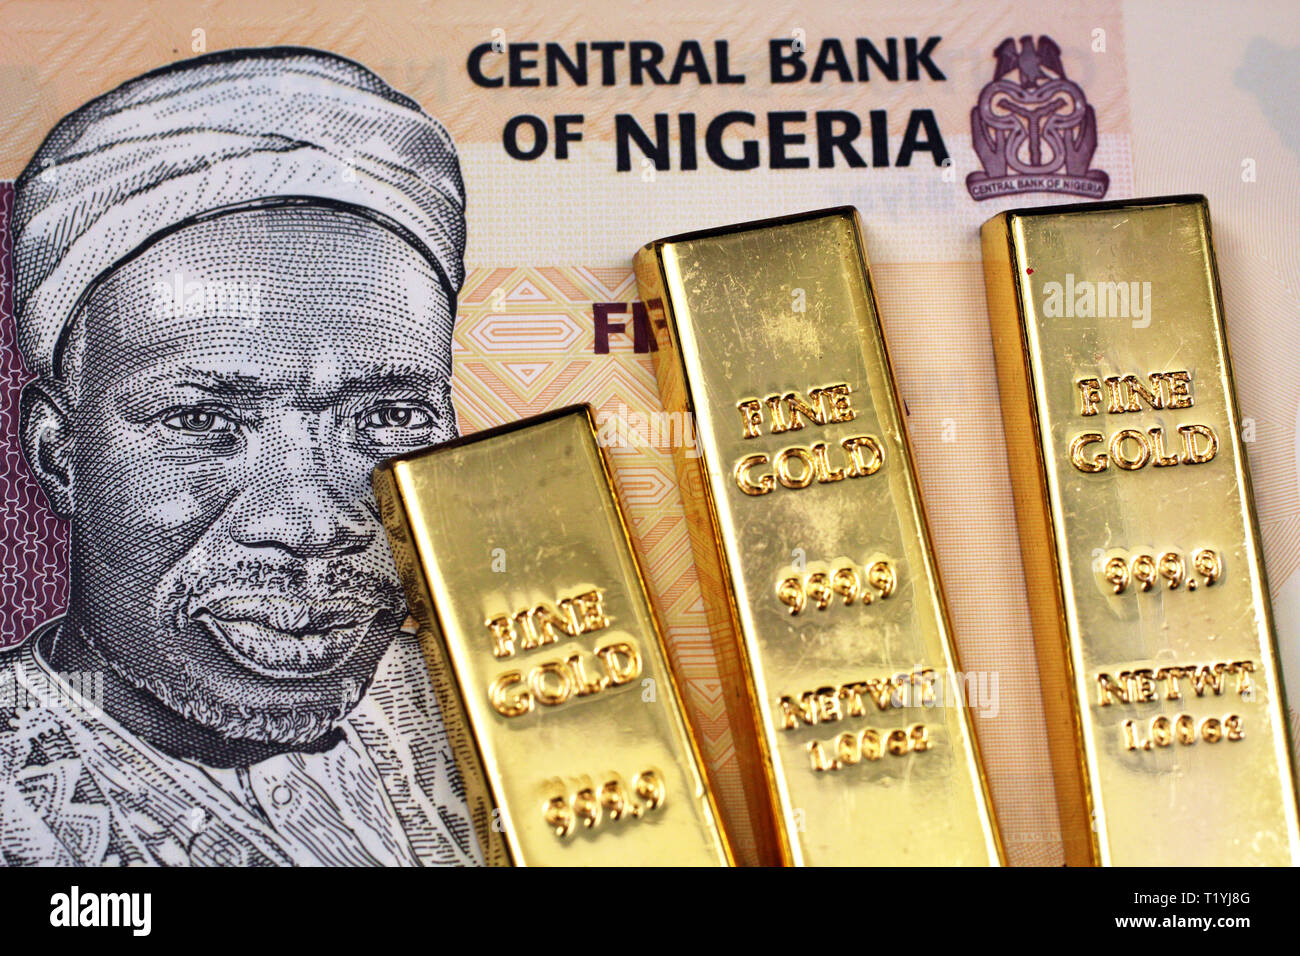 A five Nigerain naira bank note with three small gold bars close up in macro - Stock Image